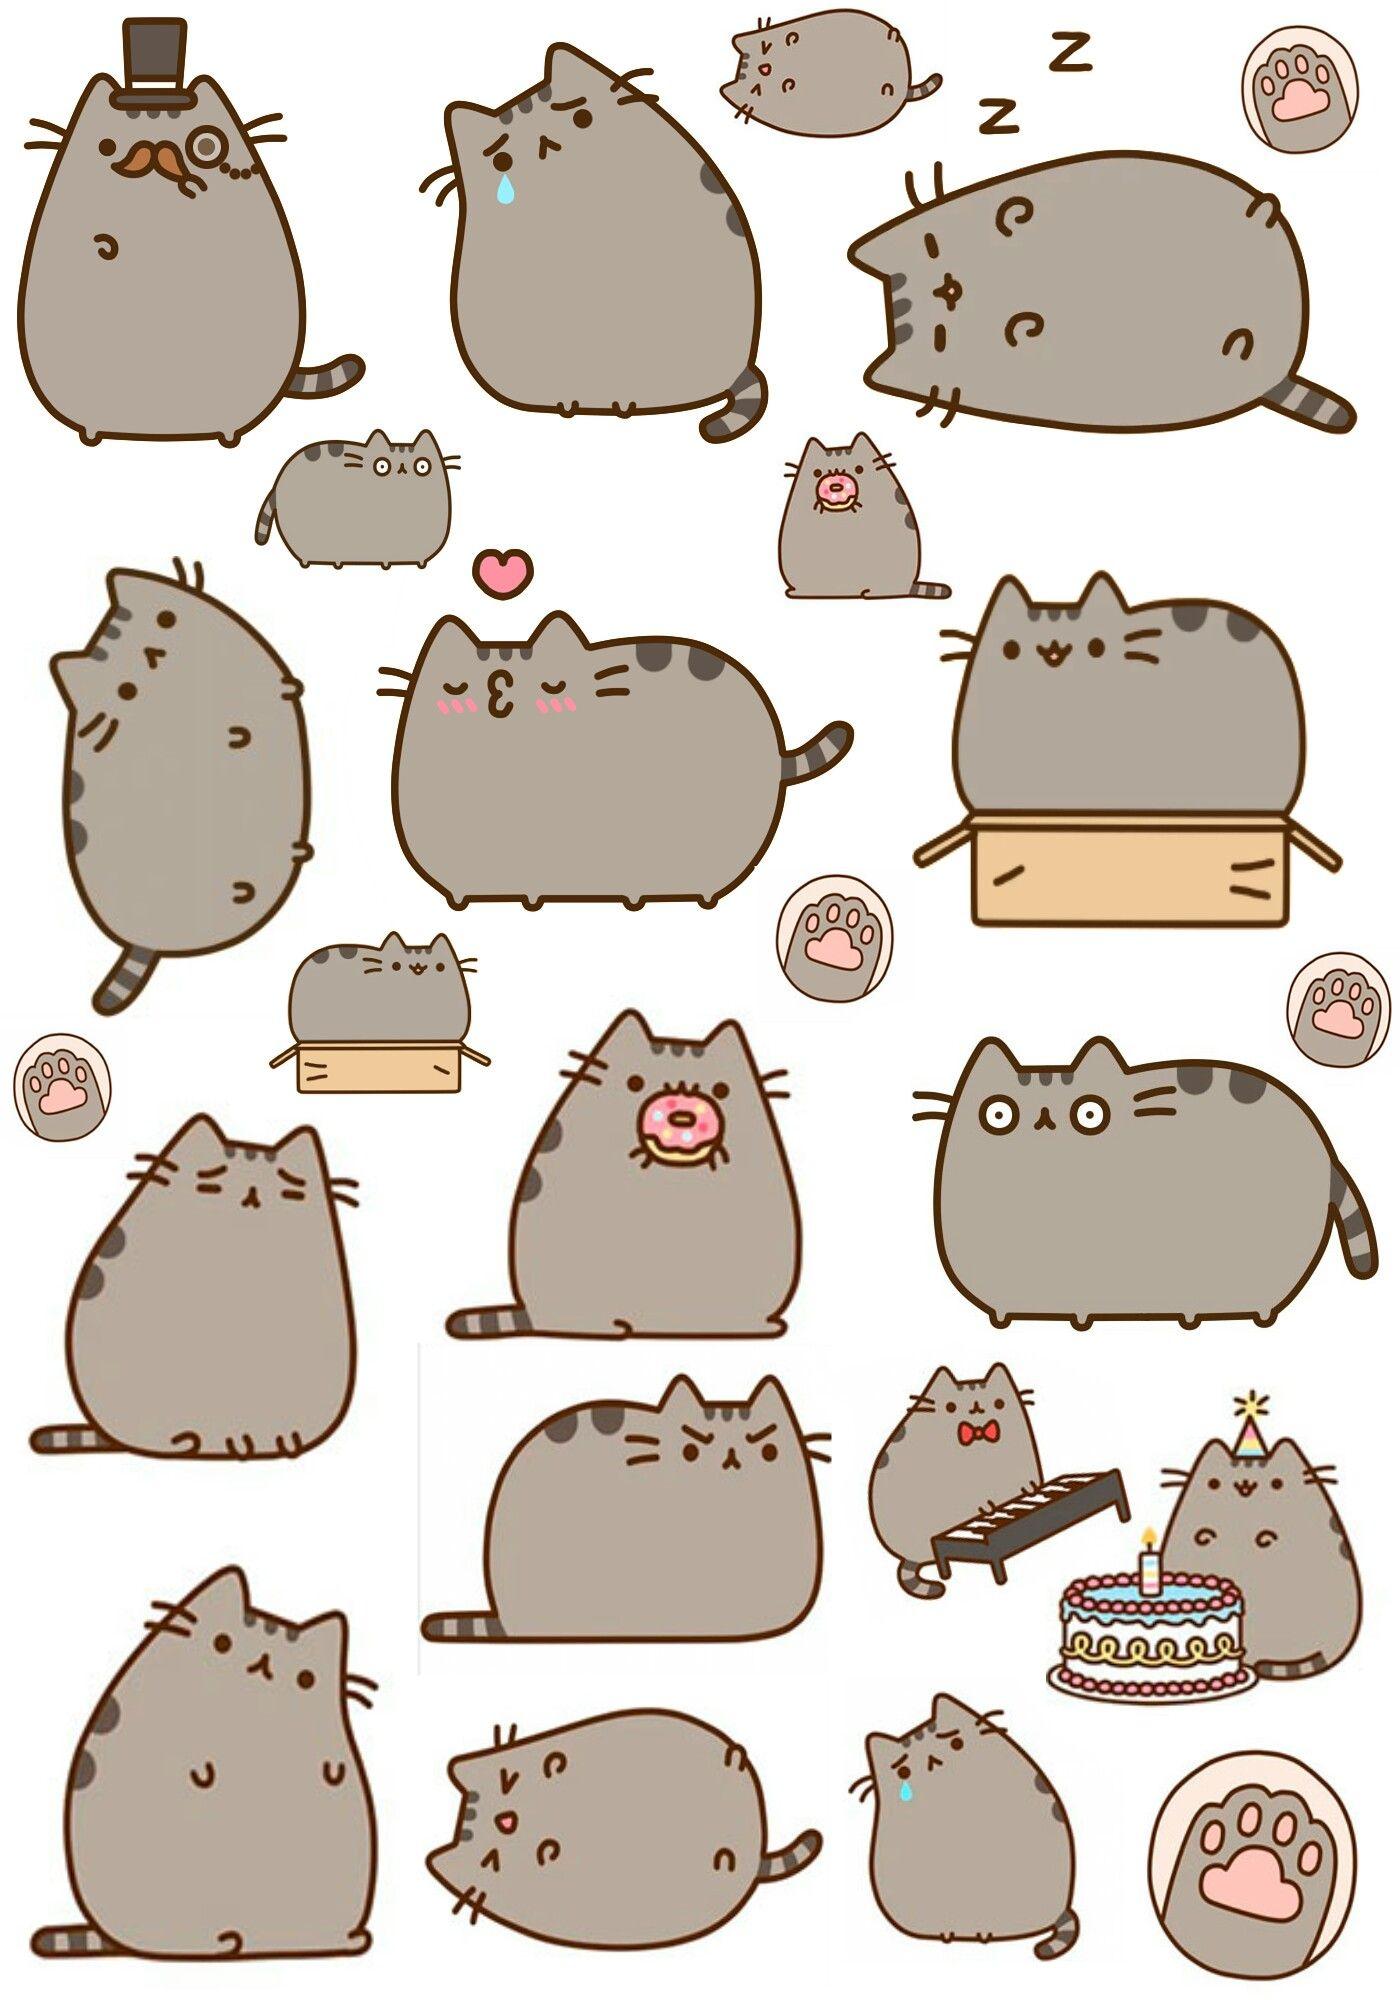 картинки на личный дневник котята